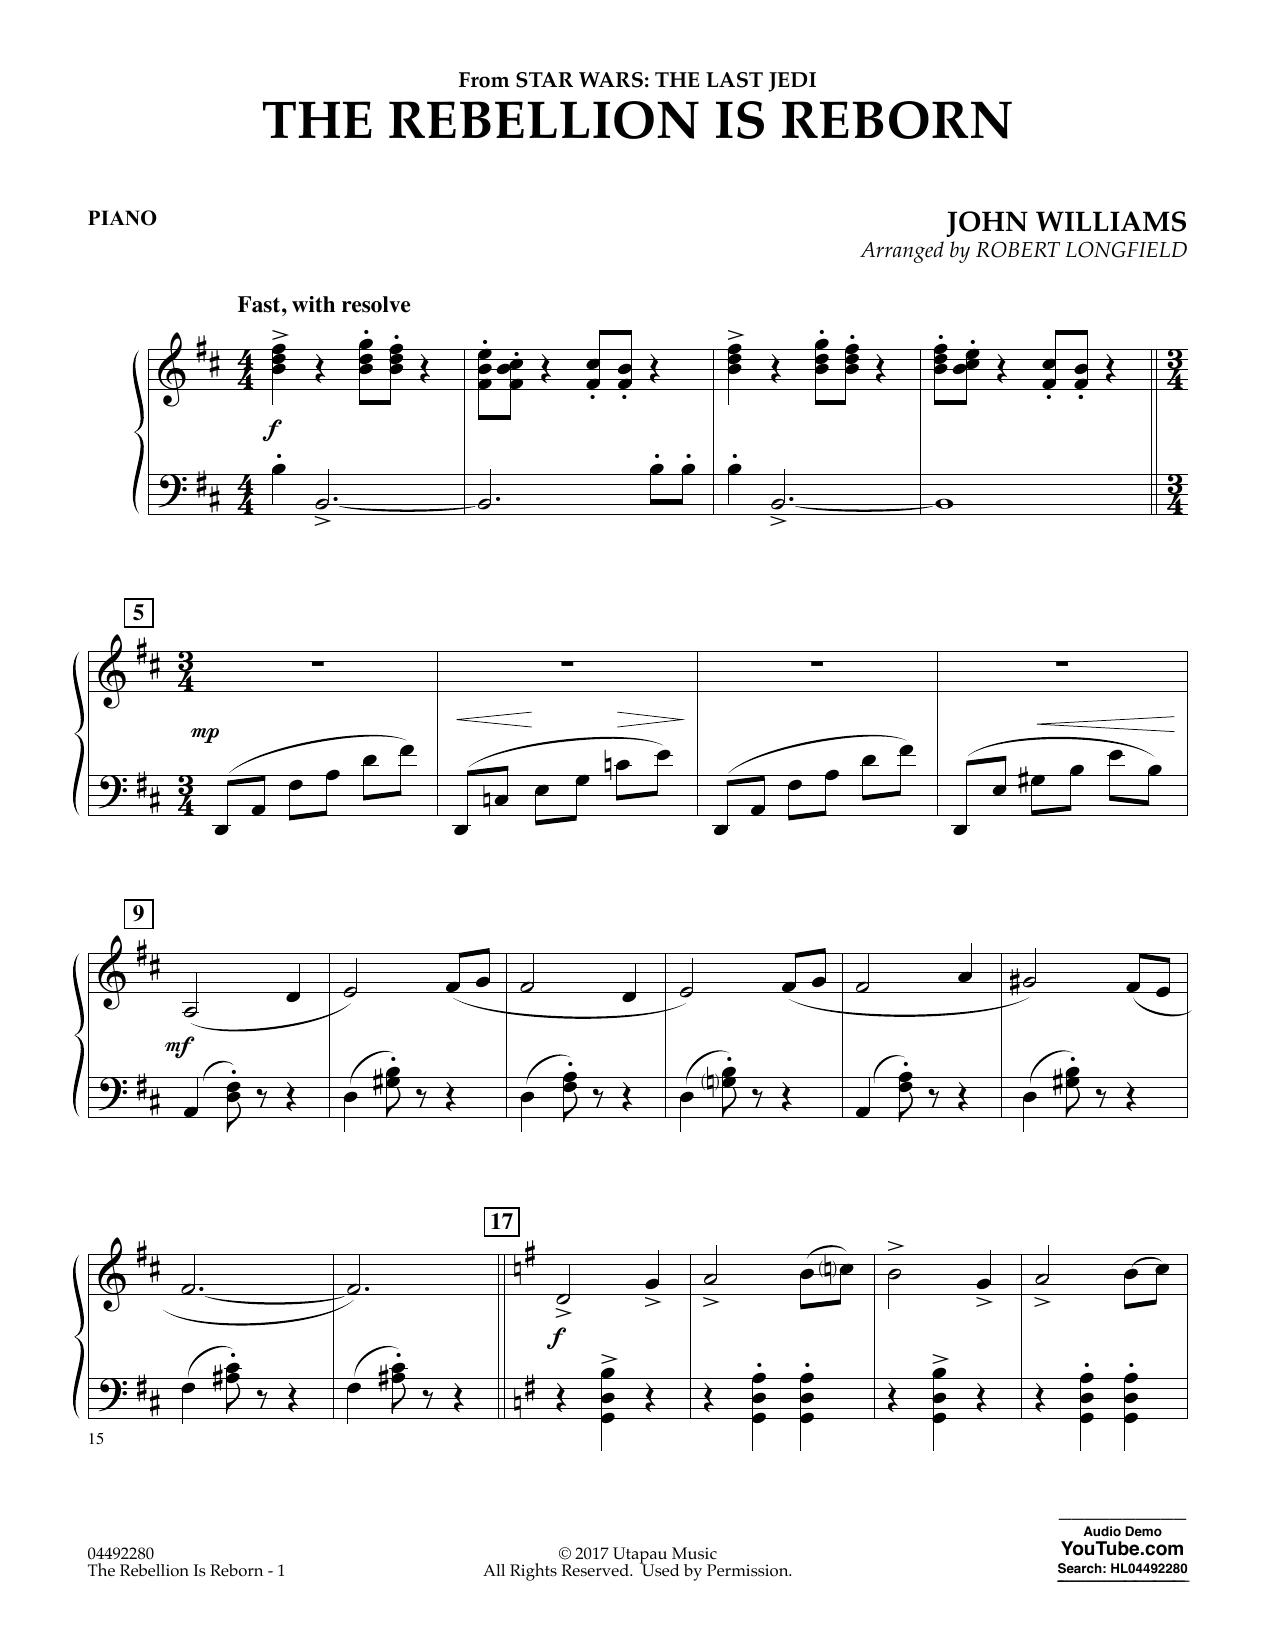 The Rebellion Is Reborn (from Star Wars: The Last Jedi) - Piano (Orchestra)